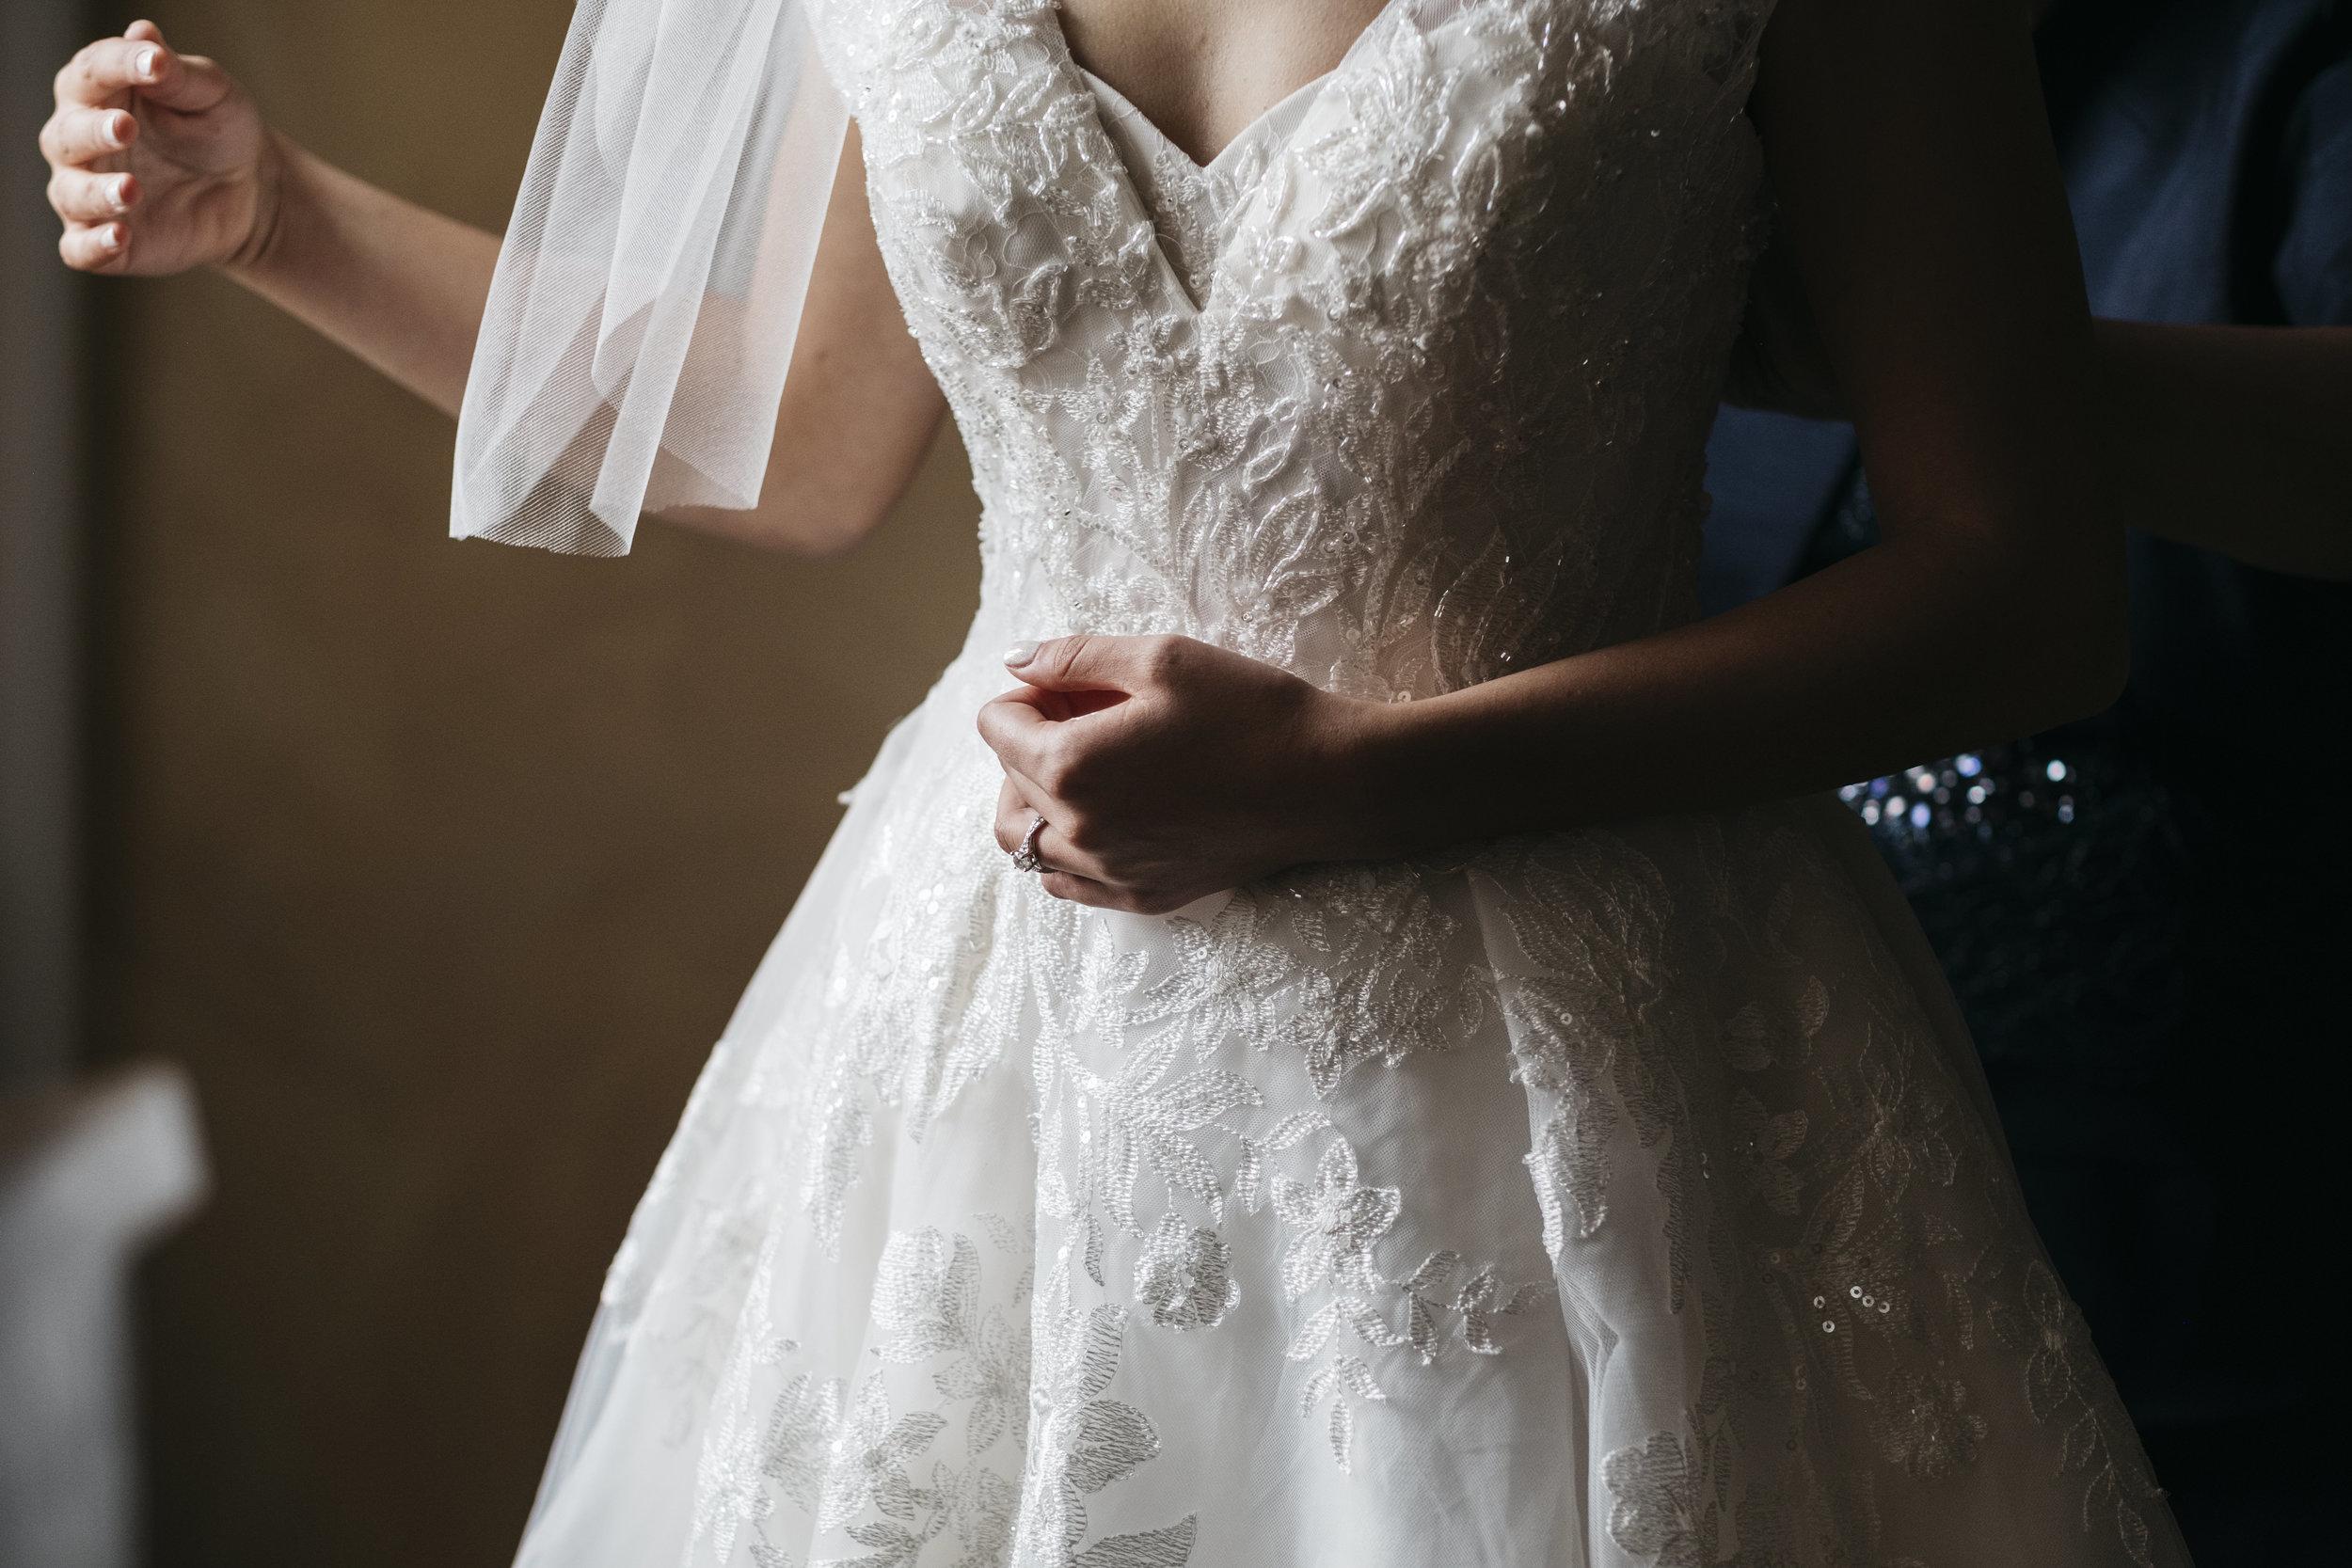 Bride Gets into Dress for Wedding with Toledo Ohio Photographers